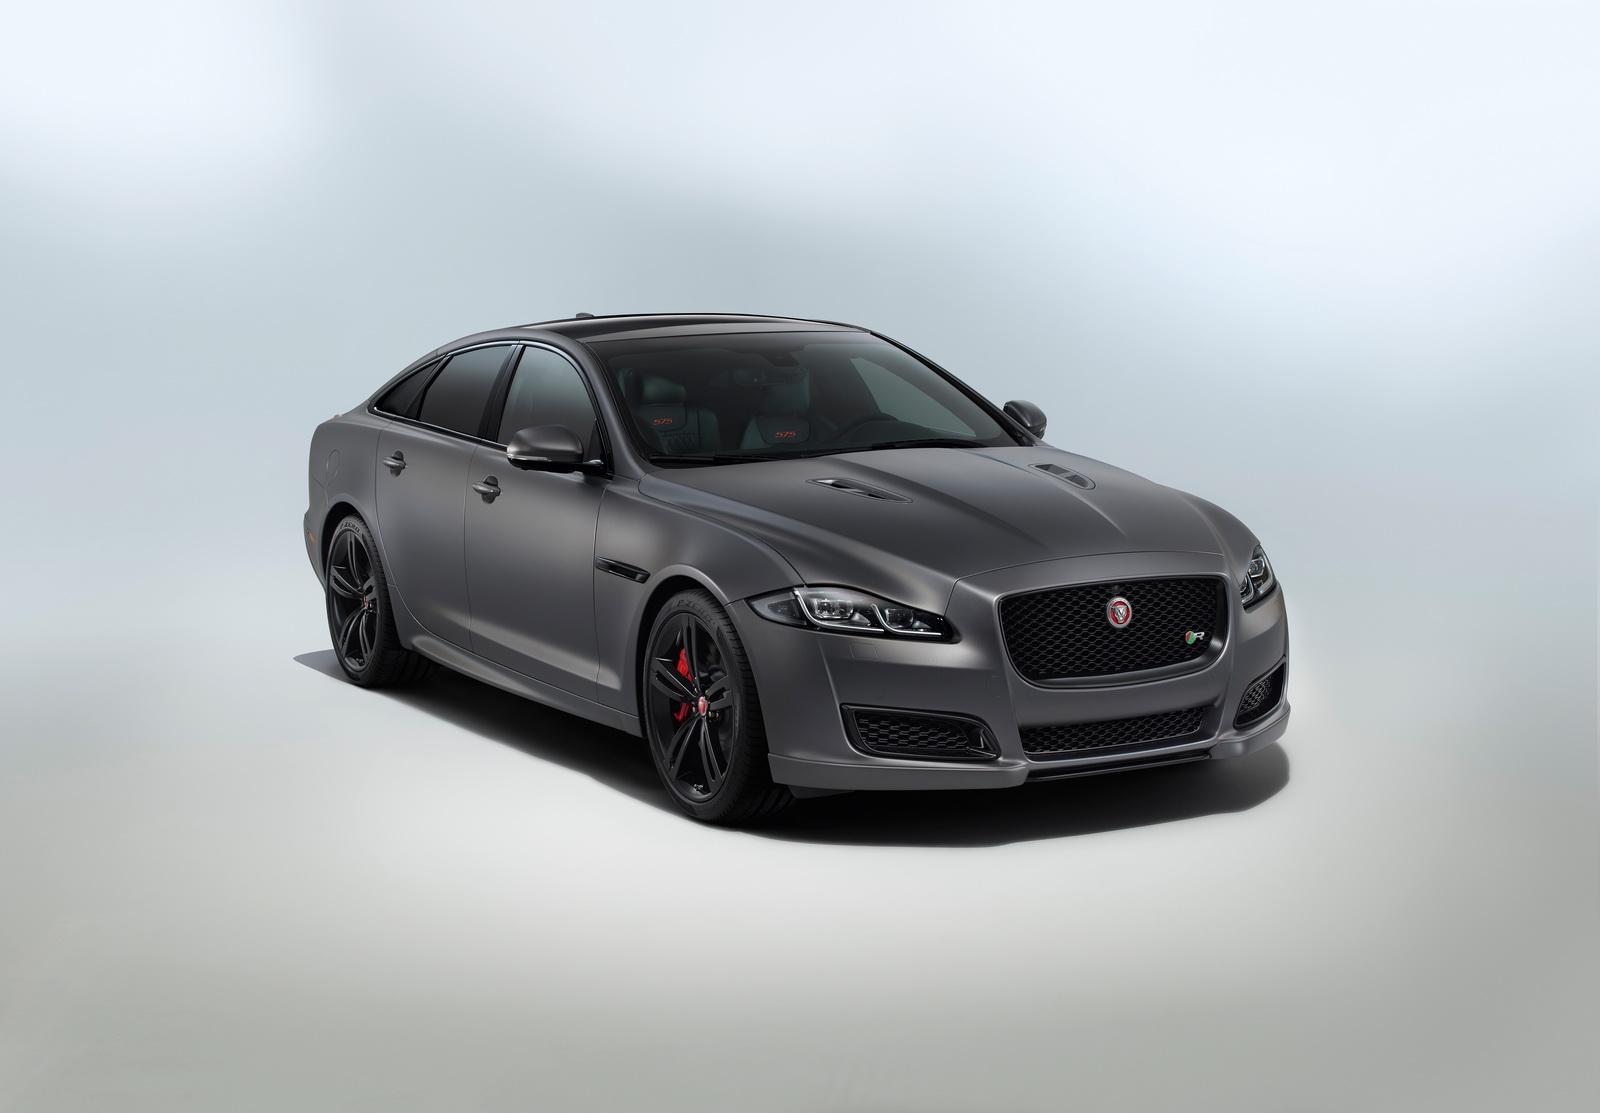 jaguars motion motor jaguar three review quarter car xj in front xjl trend series first awd cars test